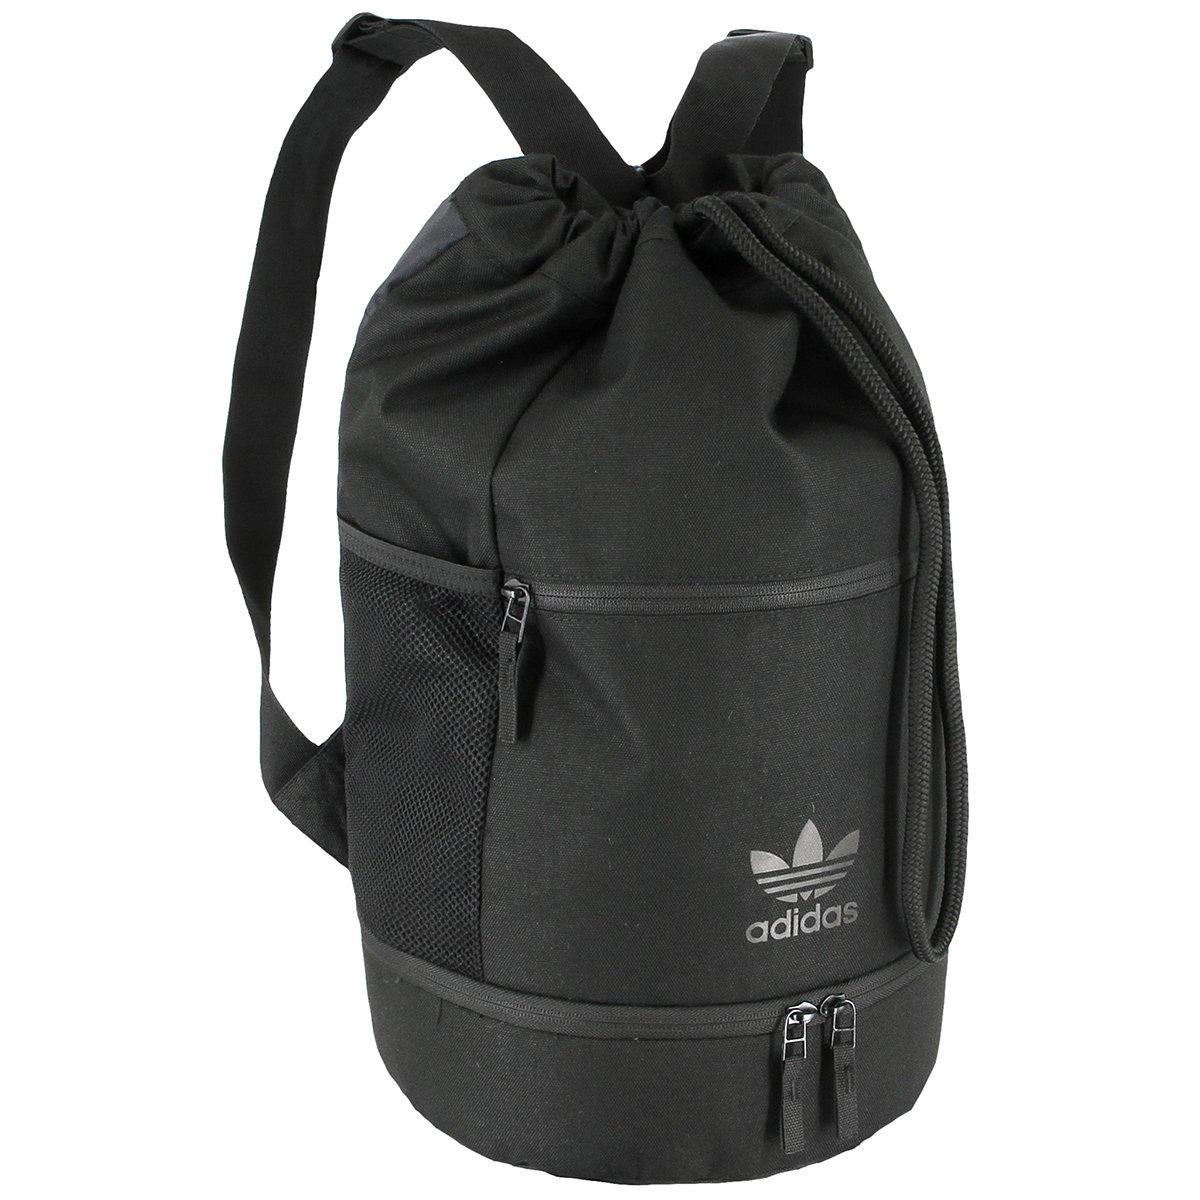 8f13bd51566 Amazon.com: adidas Originals SL Bucket Backpack, Black/Black, One Size:  Sports & Outdoors